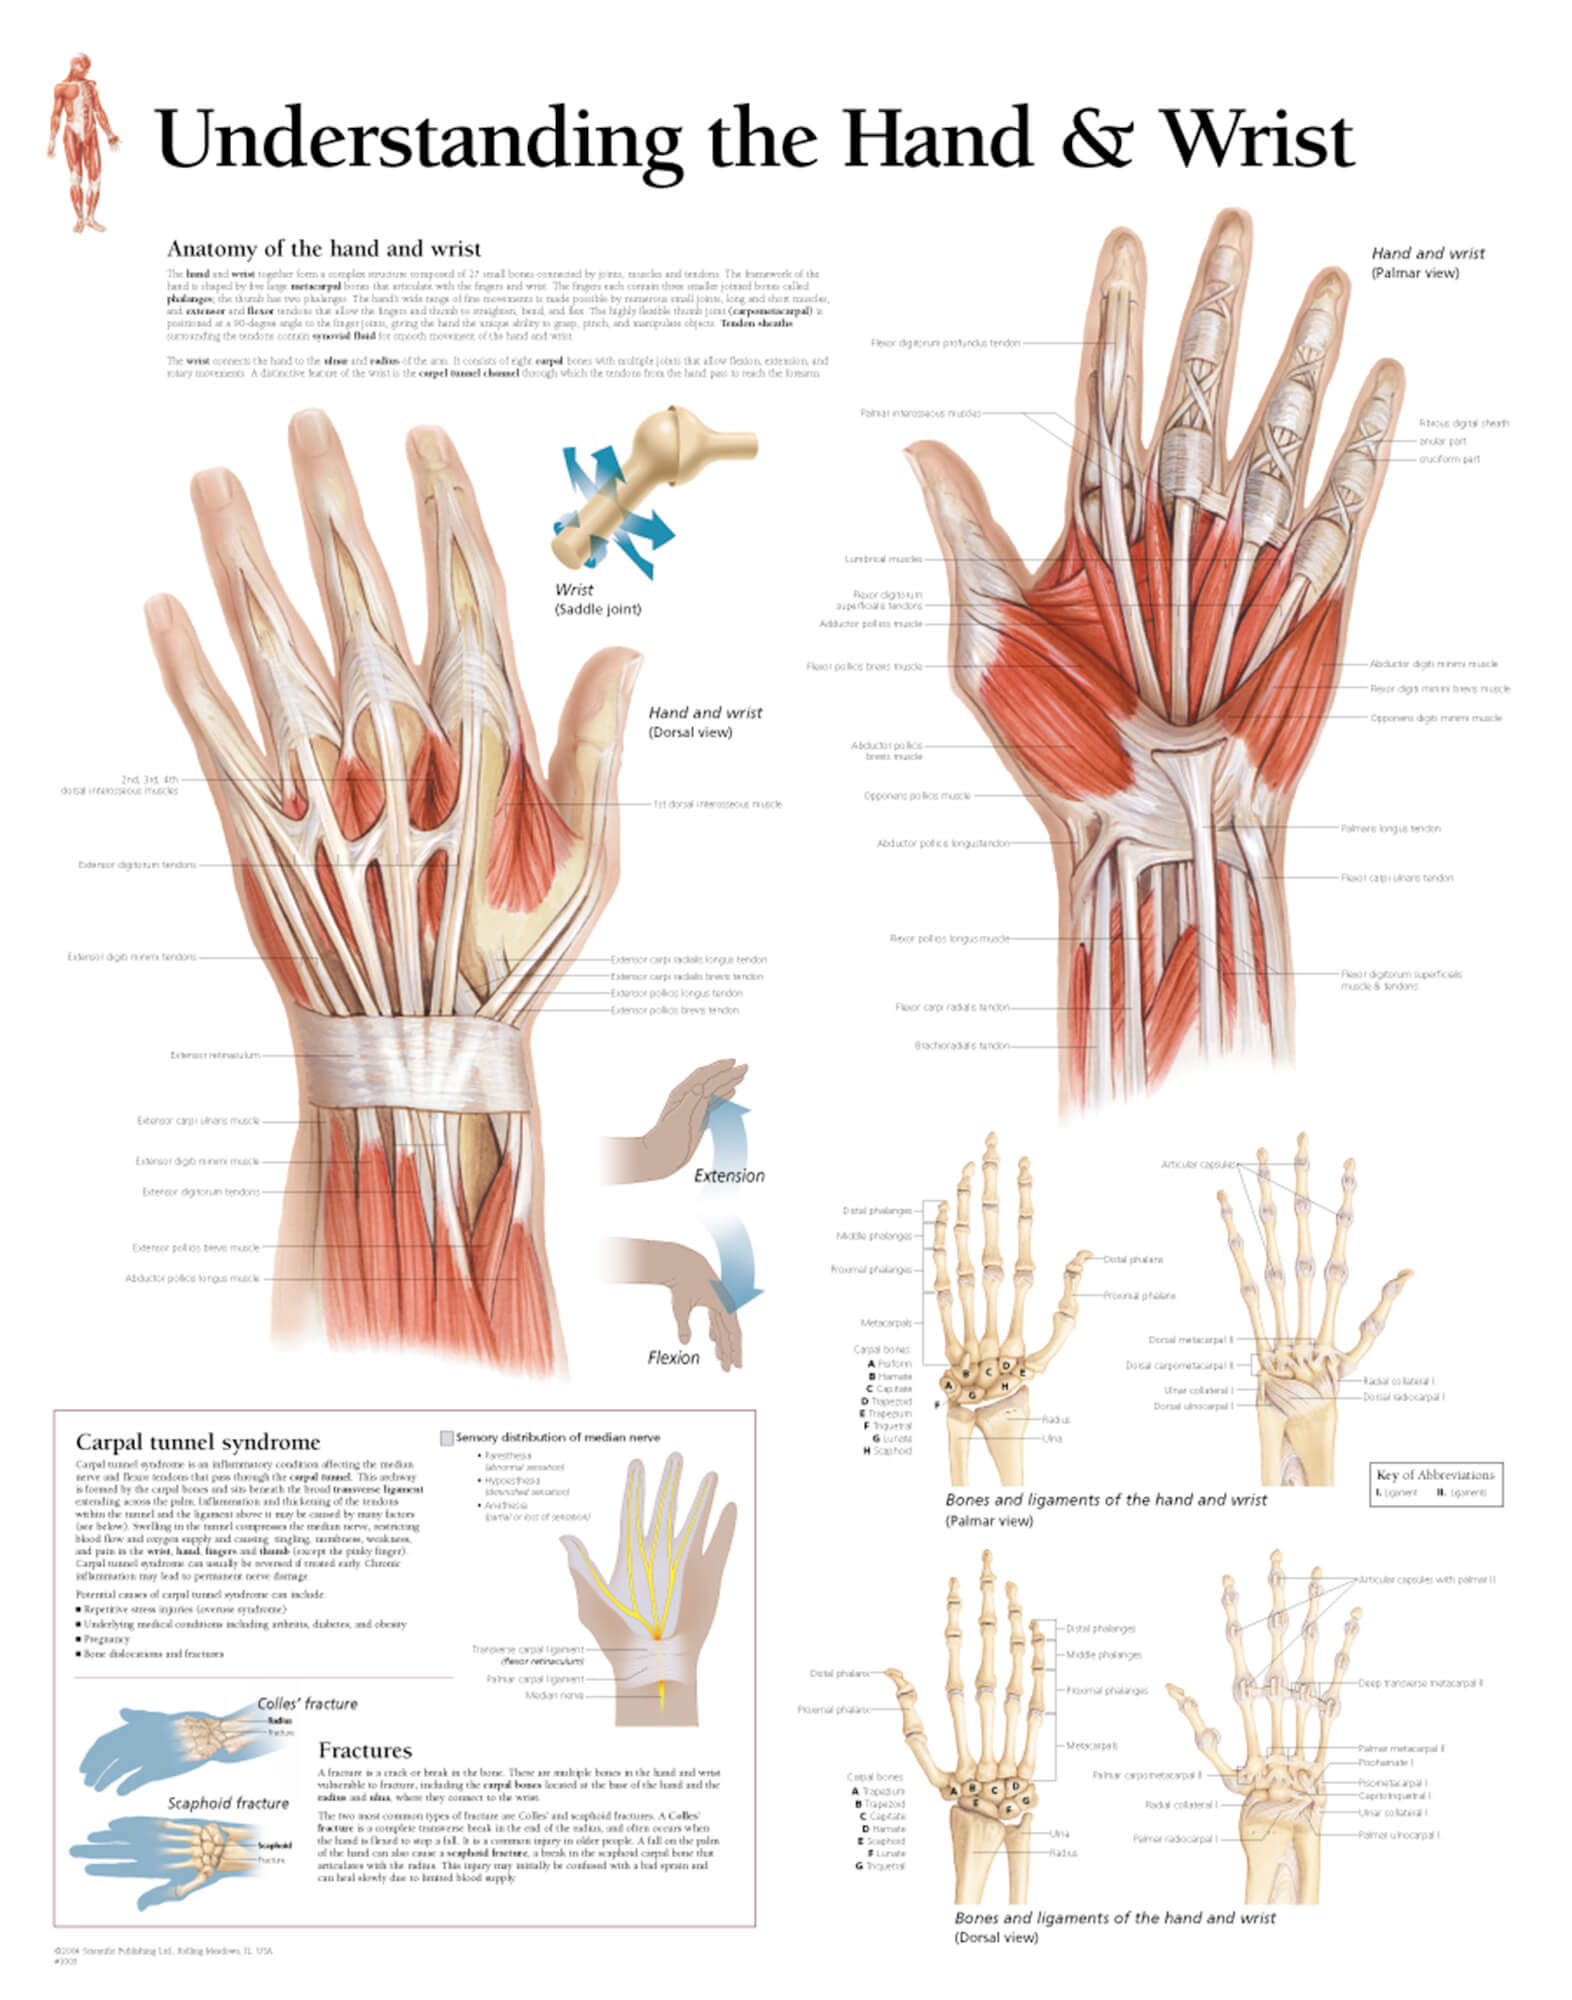 hight resolution of understanding the hand u0026 wrist u2013 scientific publishinghand and wrist anatomy